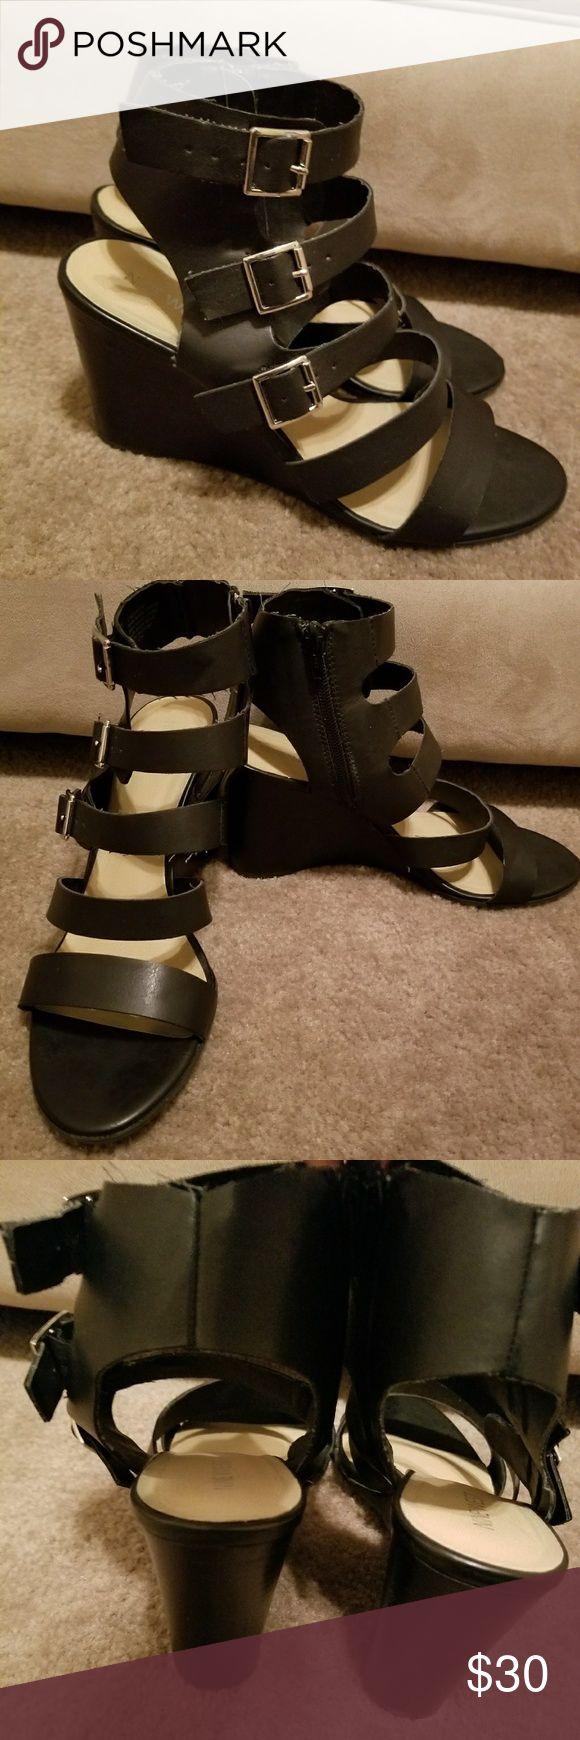 Black wedges Black wedges with buckles,zipper on the inside Nine West Shoes Wedges